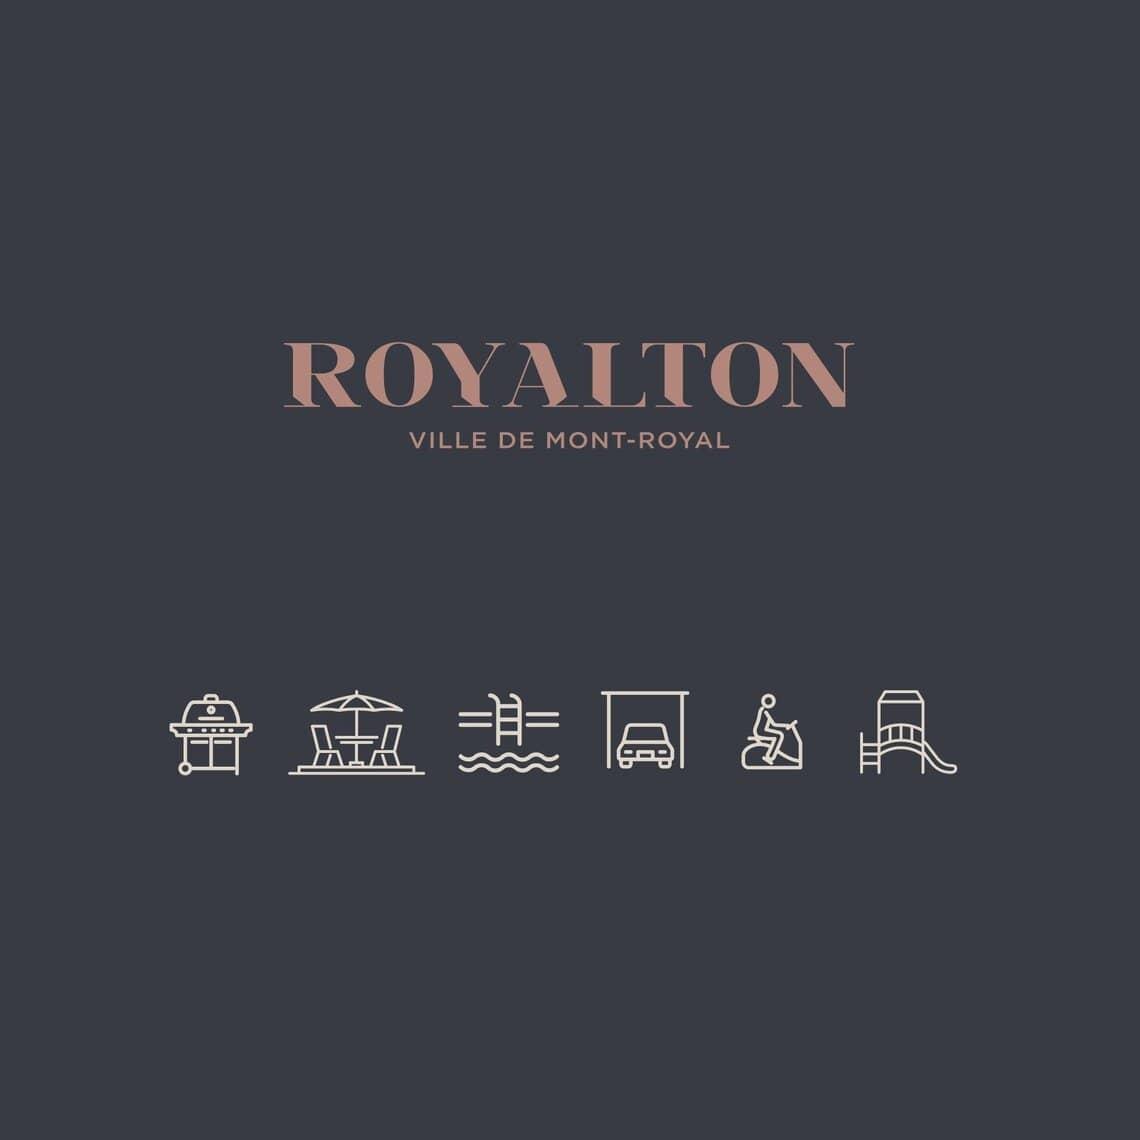 recherche maison a acheter royalton mont royal